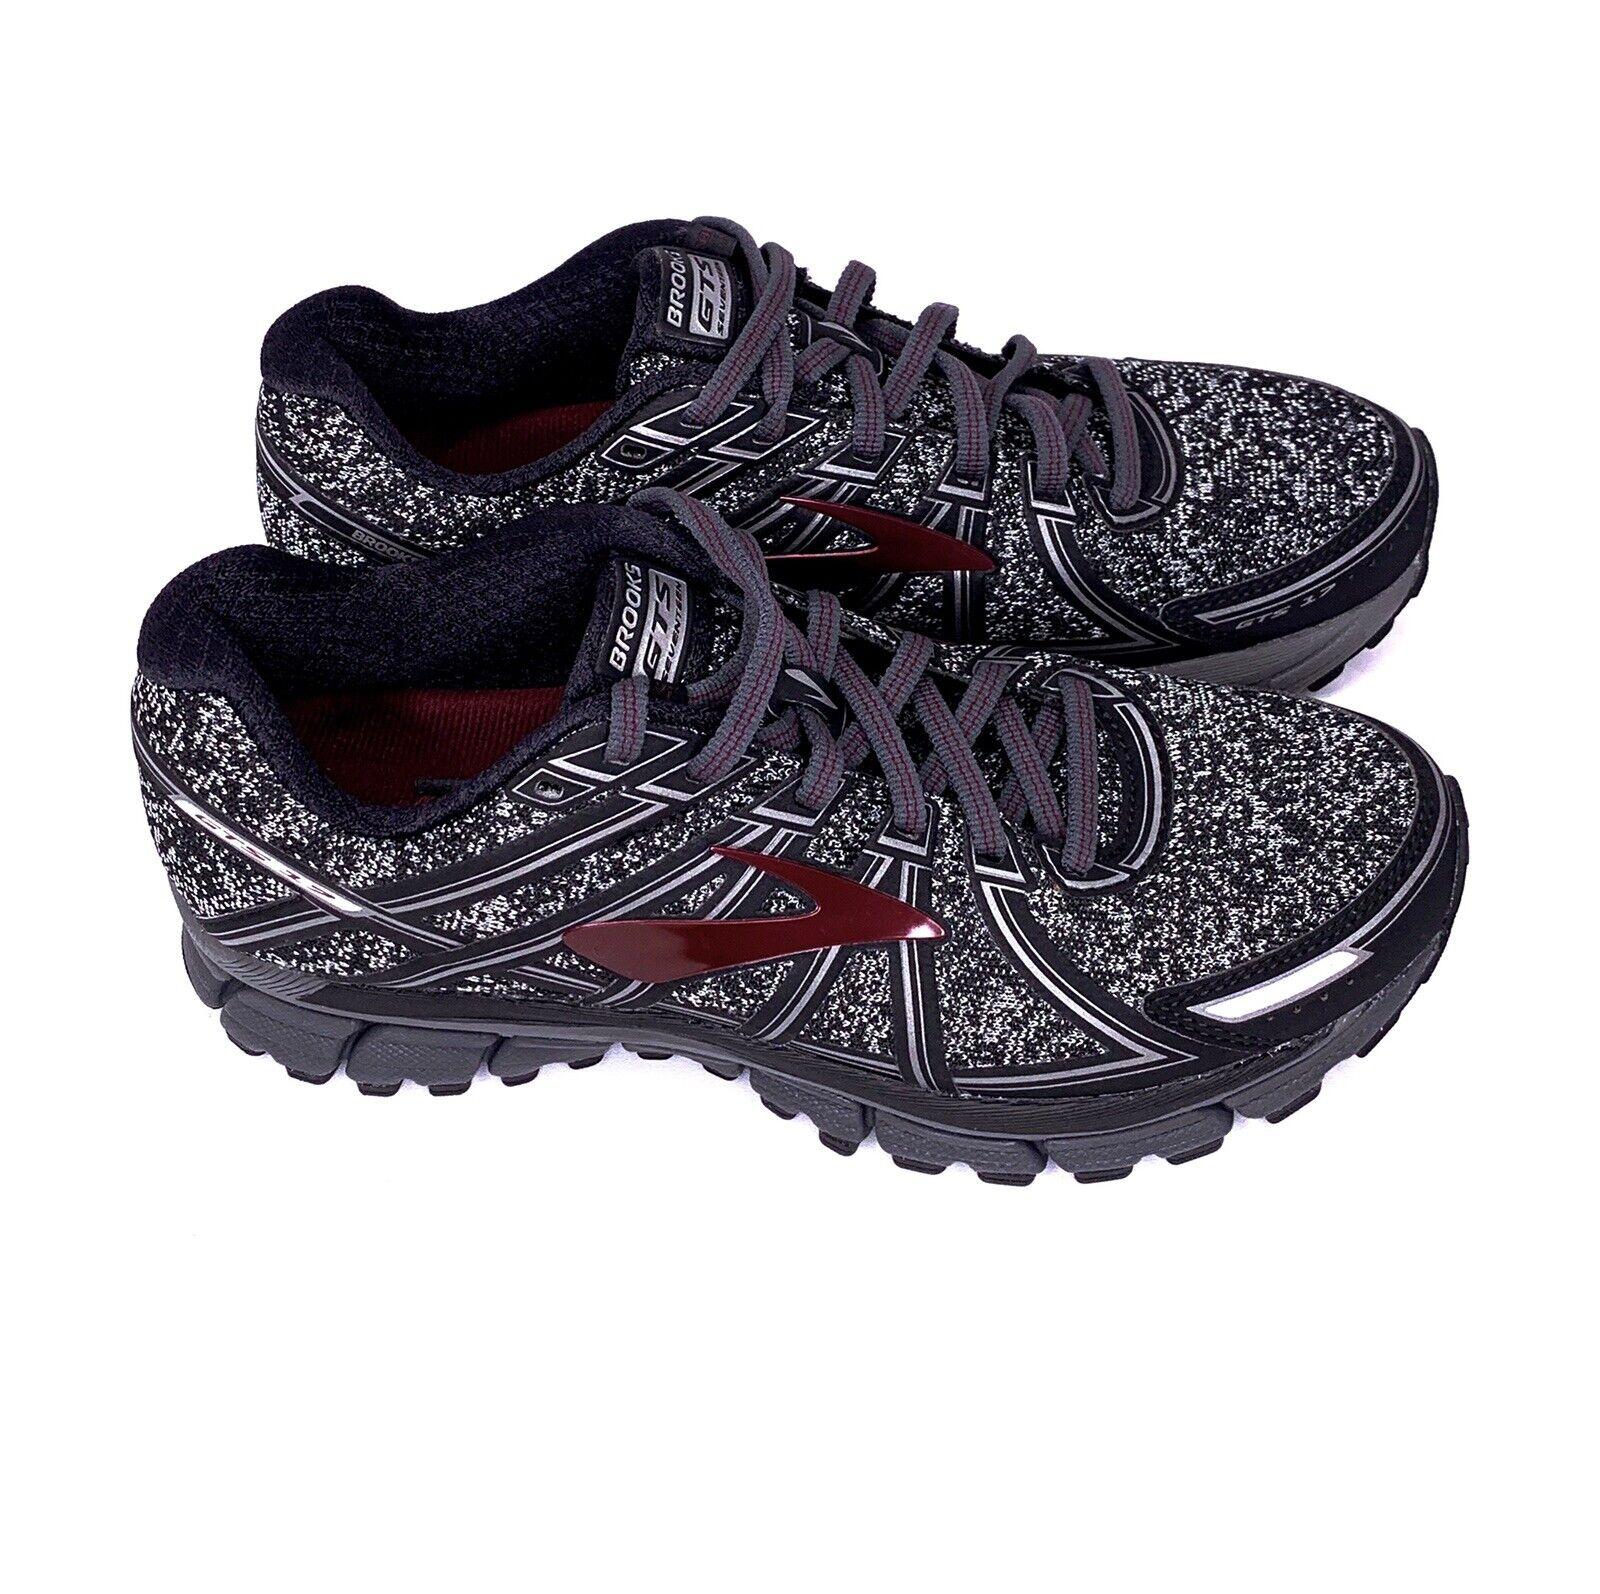 Brooks Adrenaline Gts 17 Negro Metálico Carbón Tawny Puerto Running Zapatos para hombre 8